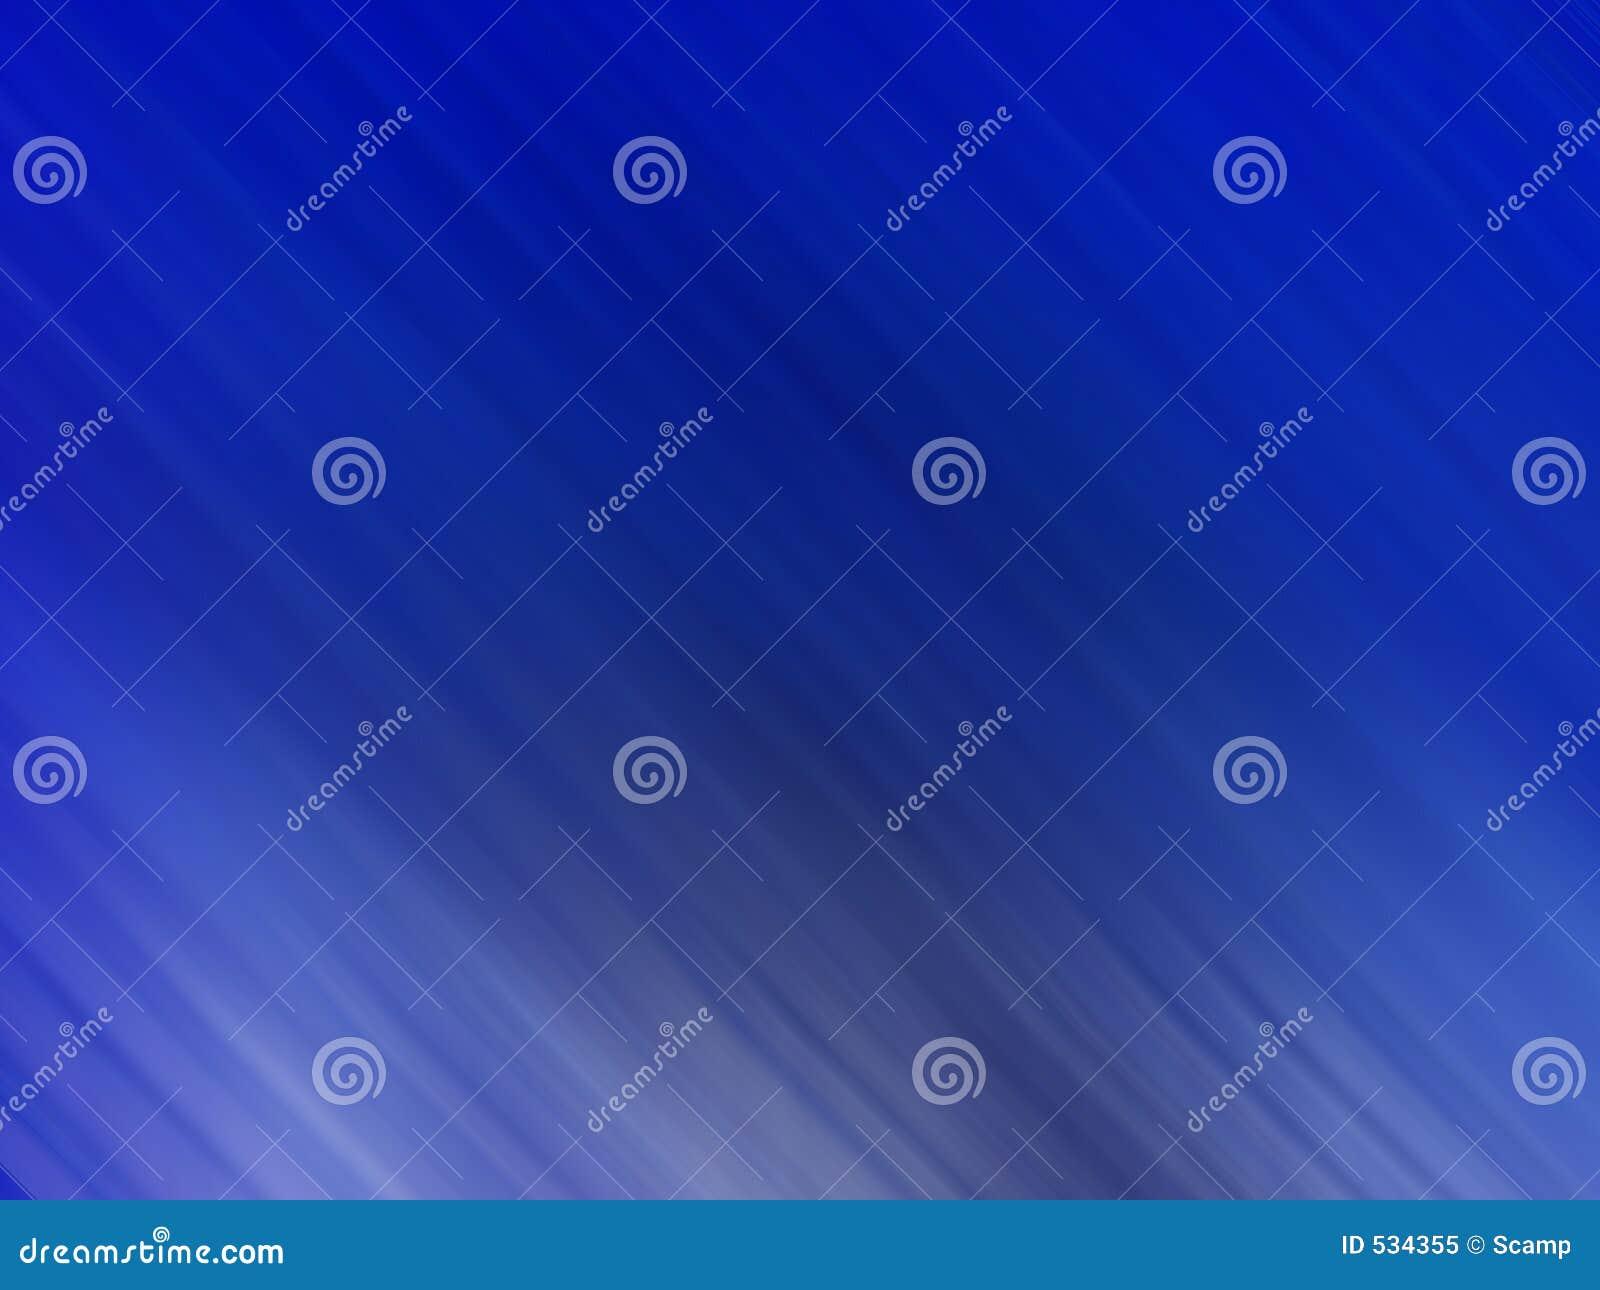 Download 背景蓝色光芒 库存例证. 插画 包括有 蓝色, 黑暗, 平稳, 安慰, 抽象, 愤怒, 背包徒步旅行者, 对角 - 534355